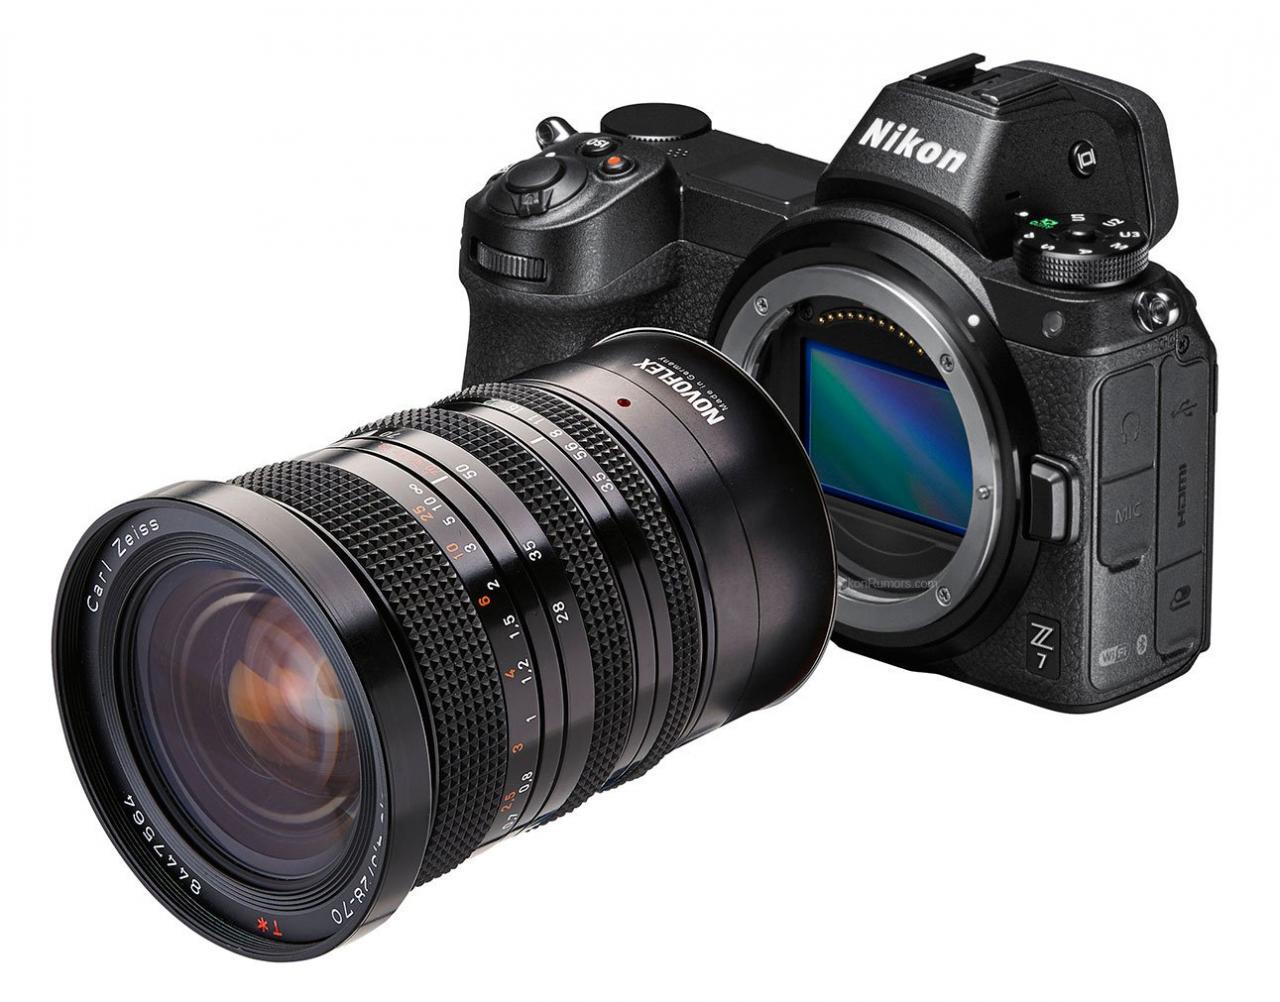 Đang tải Novoflex-adapters-for-Nikon-Z-mirrorless-camera-1.jpg…